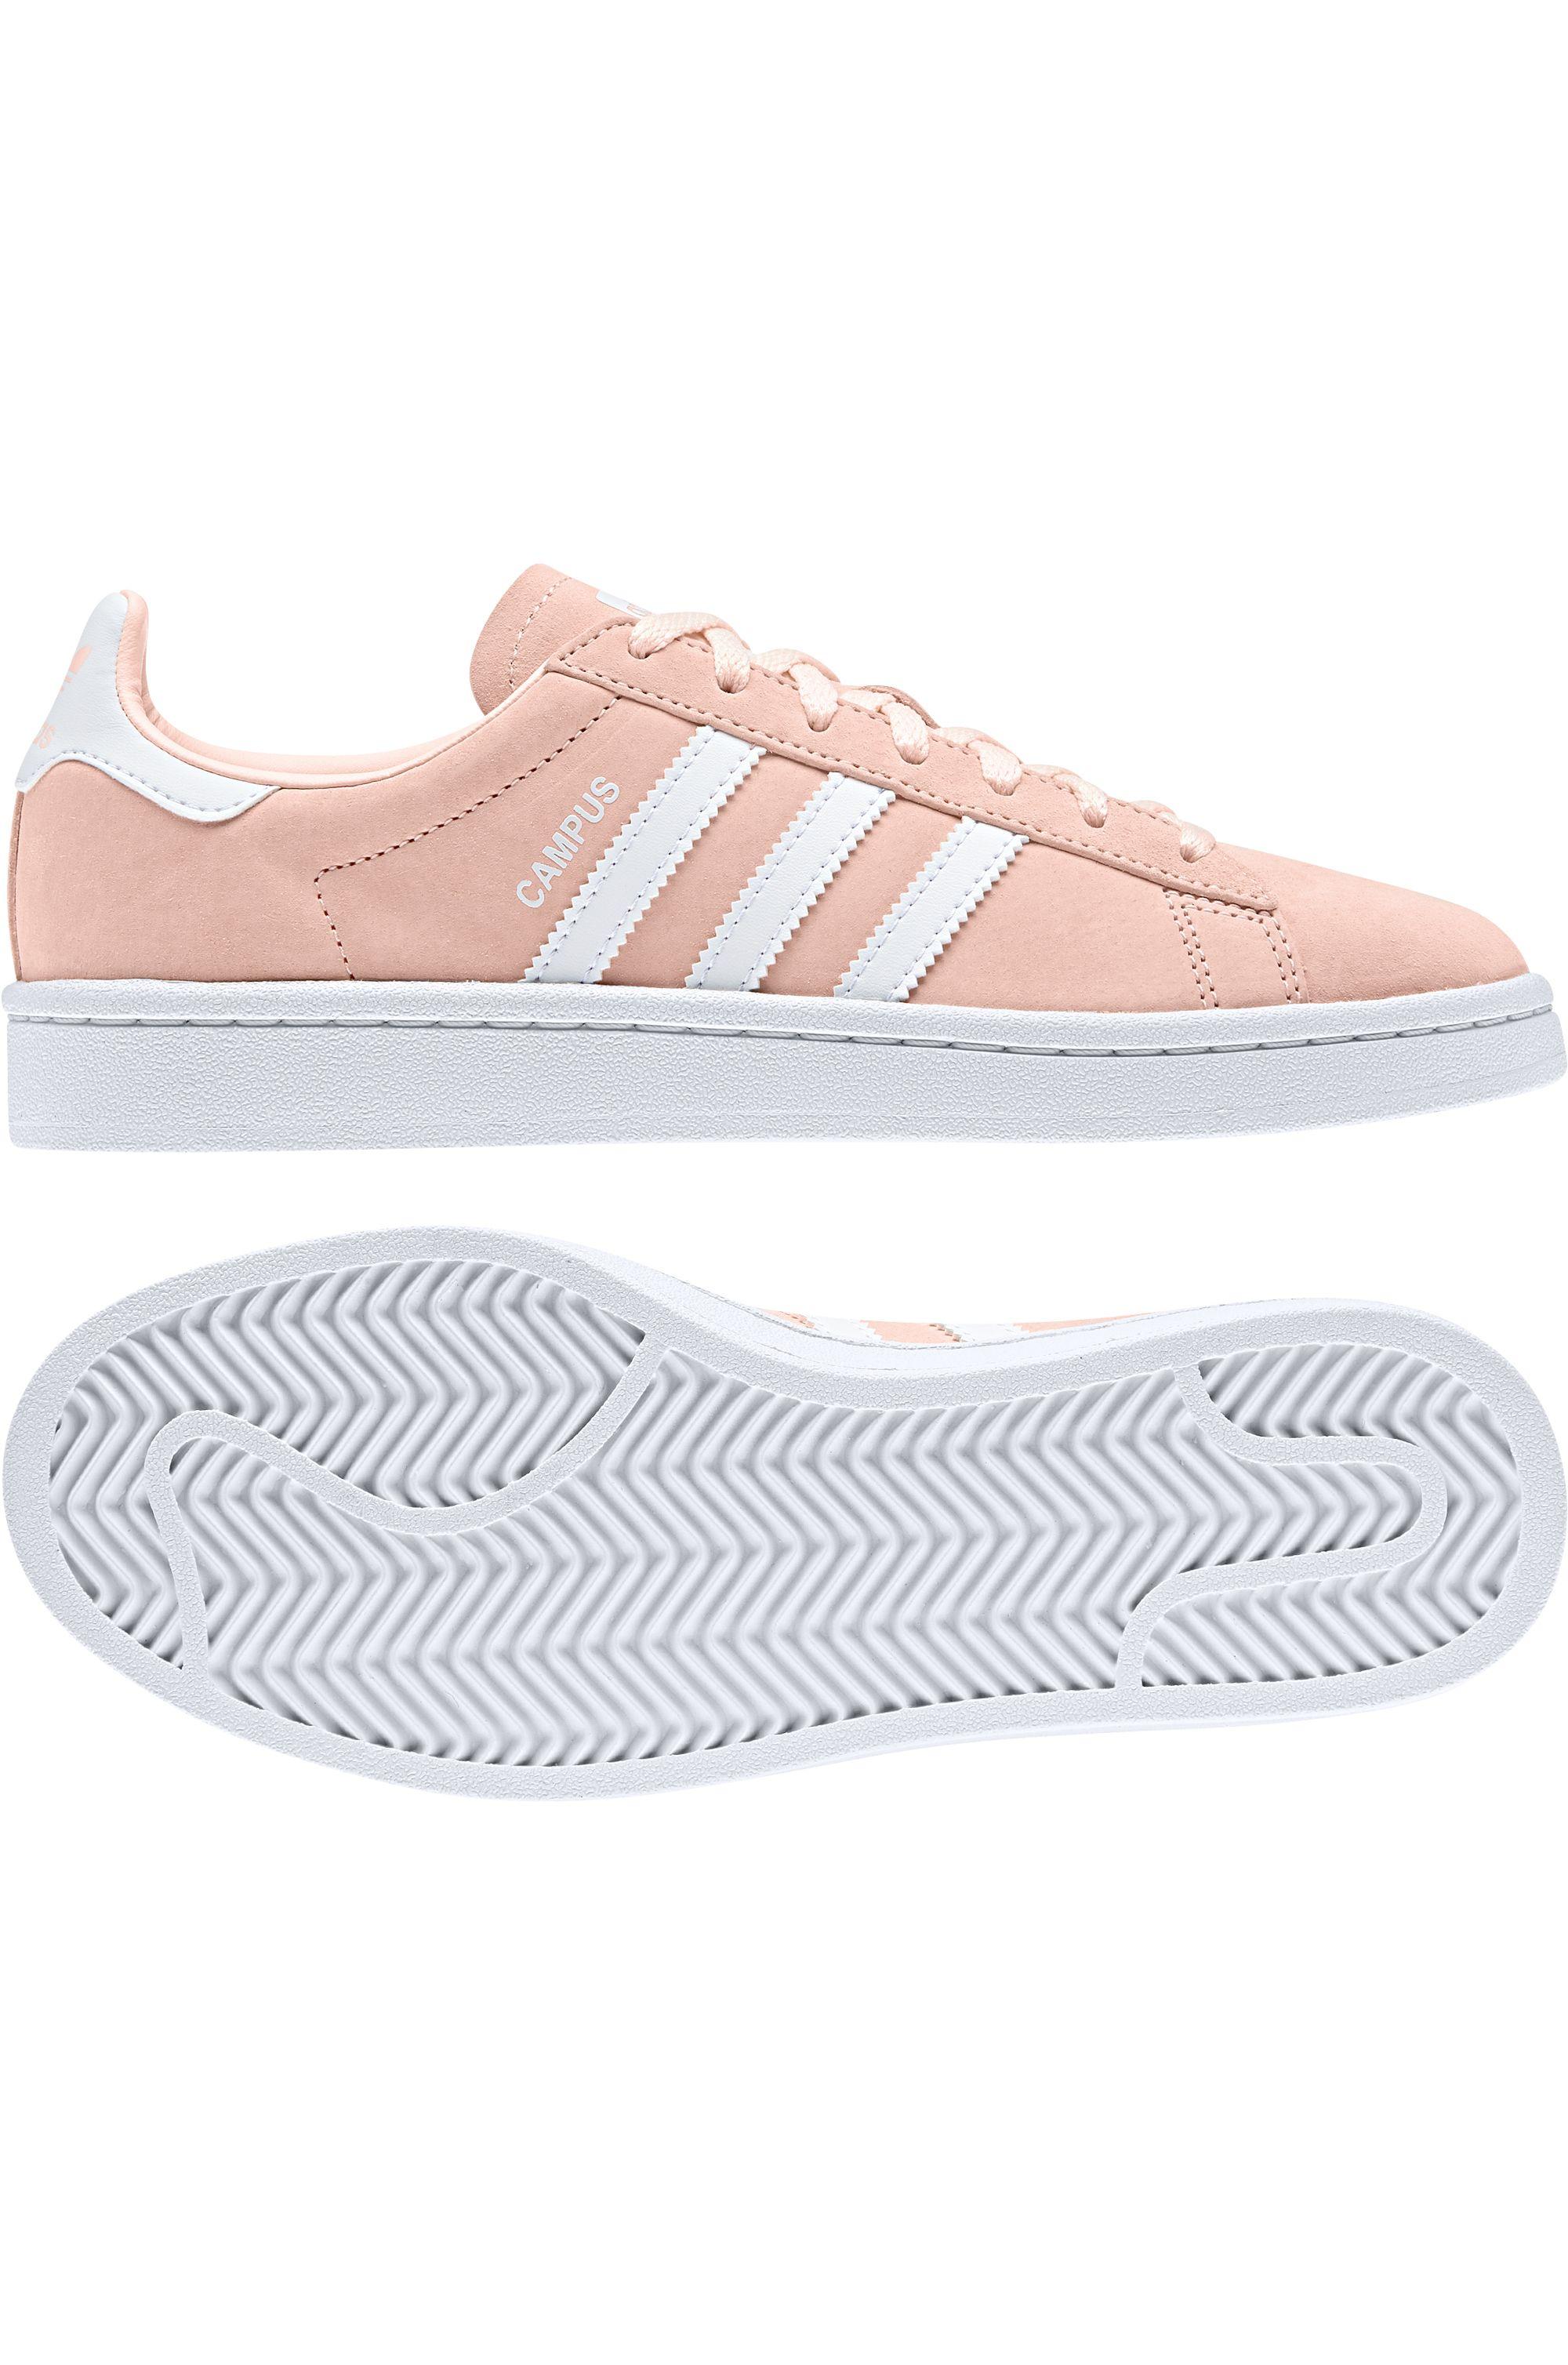 Tenis Adidas CAMPUS Clear Orange/Ftwr White/Crystal White